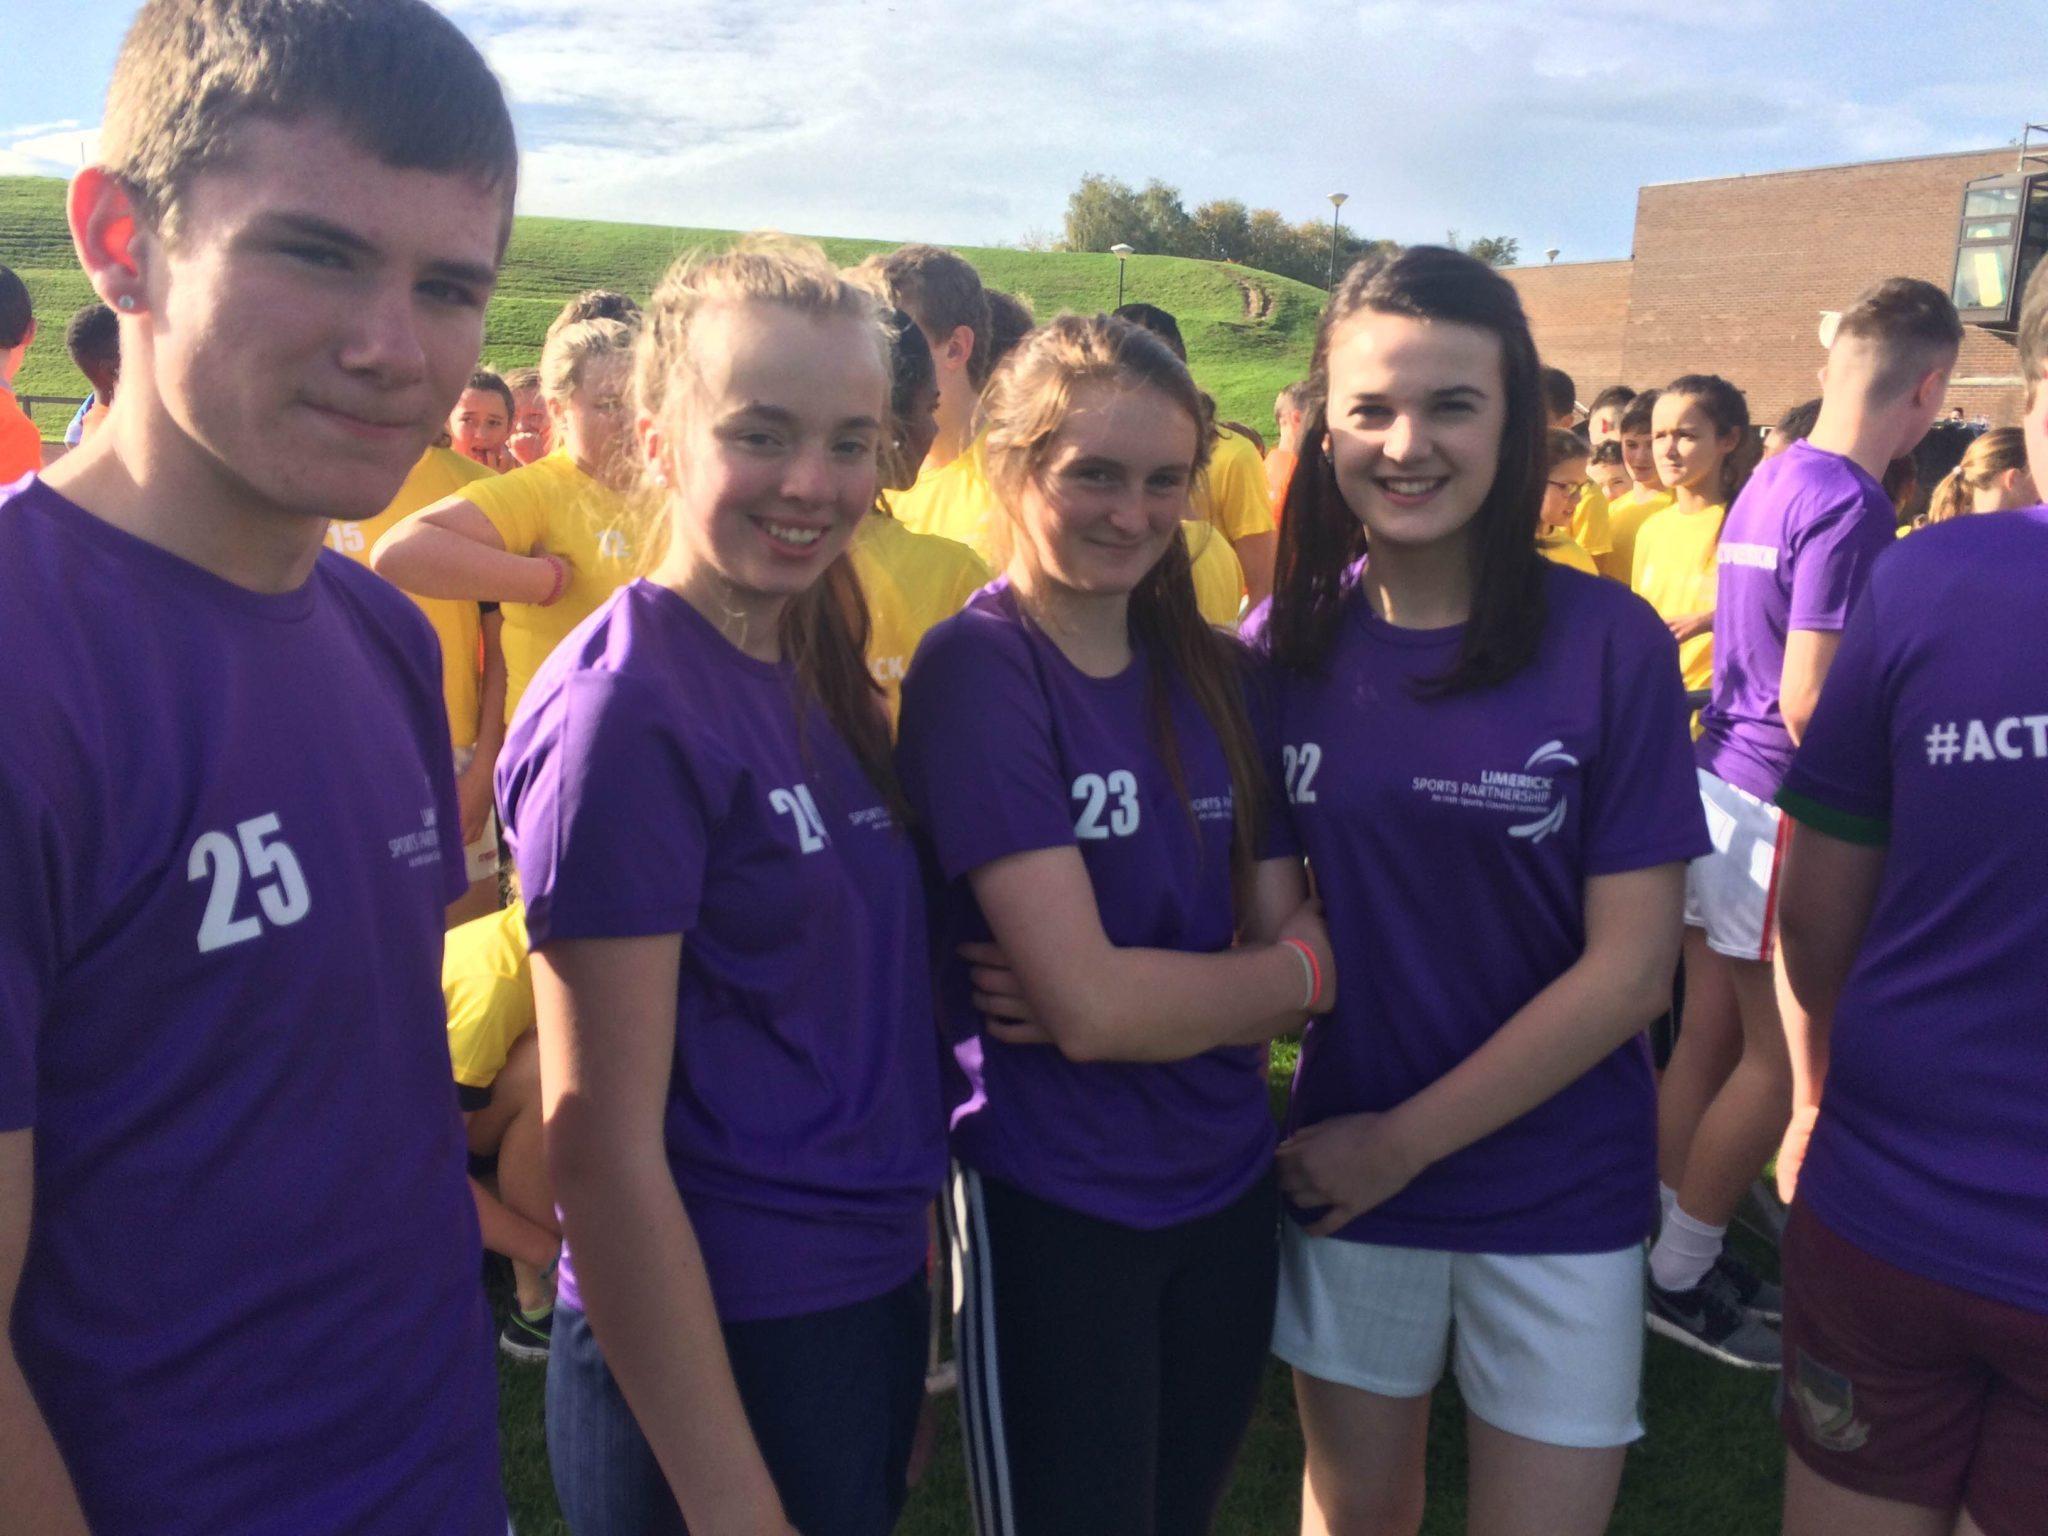 John Paul Gahan, Chloe Walsh, Iris Kennelly and Clodagh McNamee at the World Marathon Challenge in UL